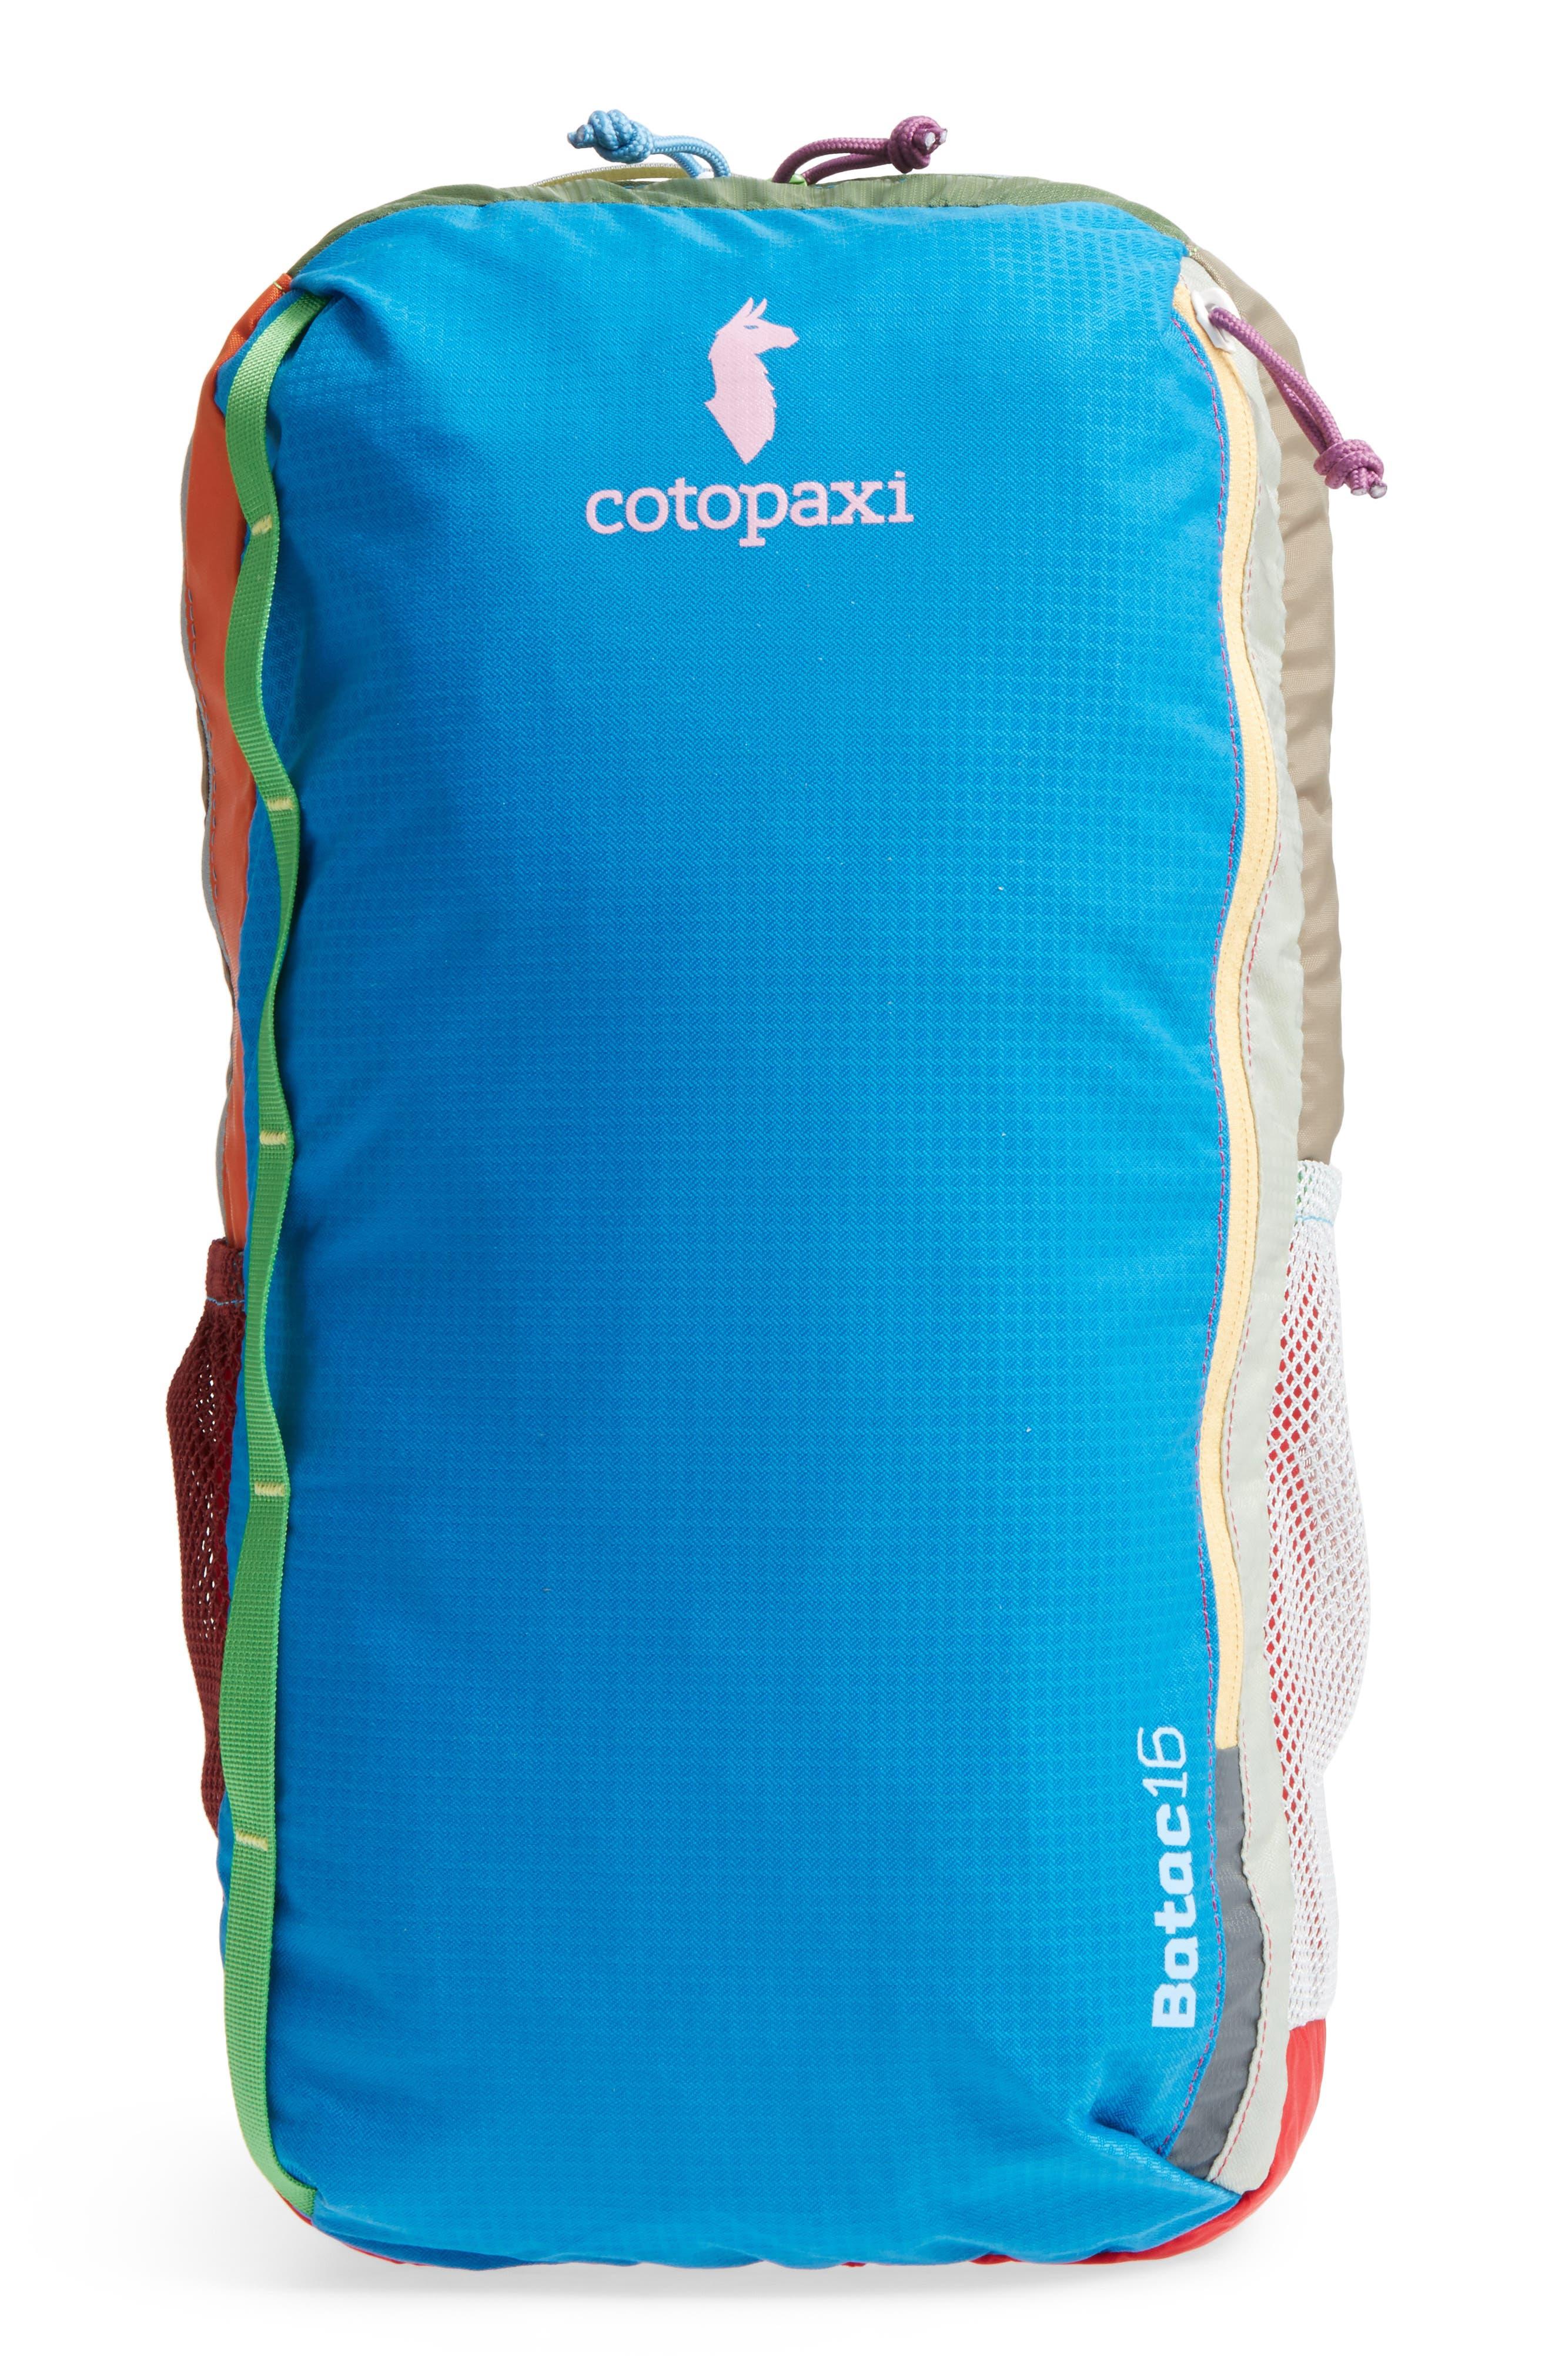 Cotopaxi Batac Del Día One of a Kind Ripstop Nylon Daypack (16L)